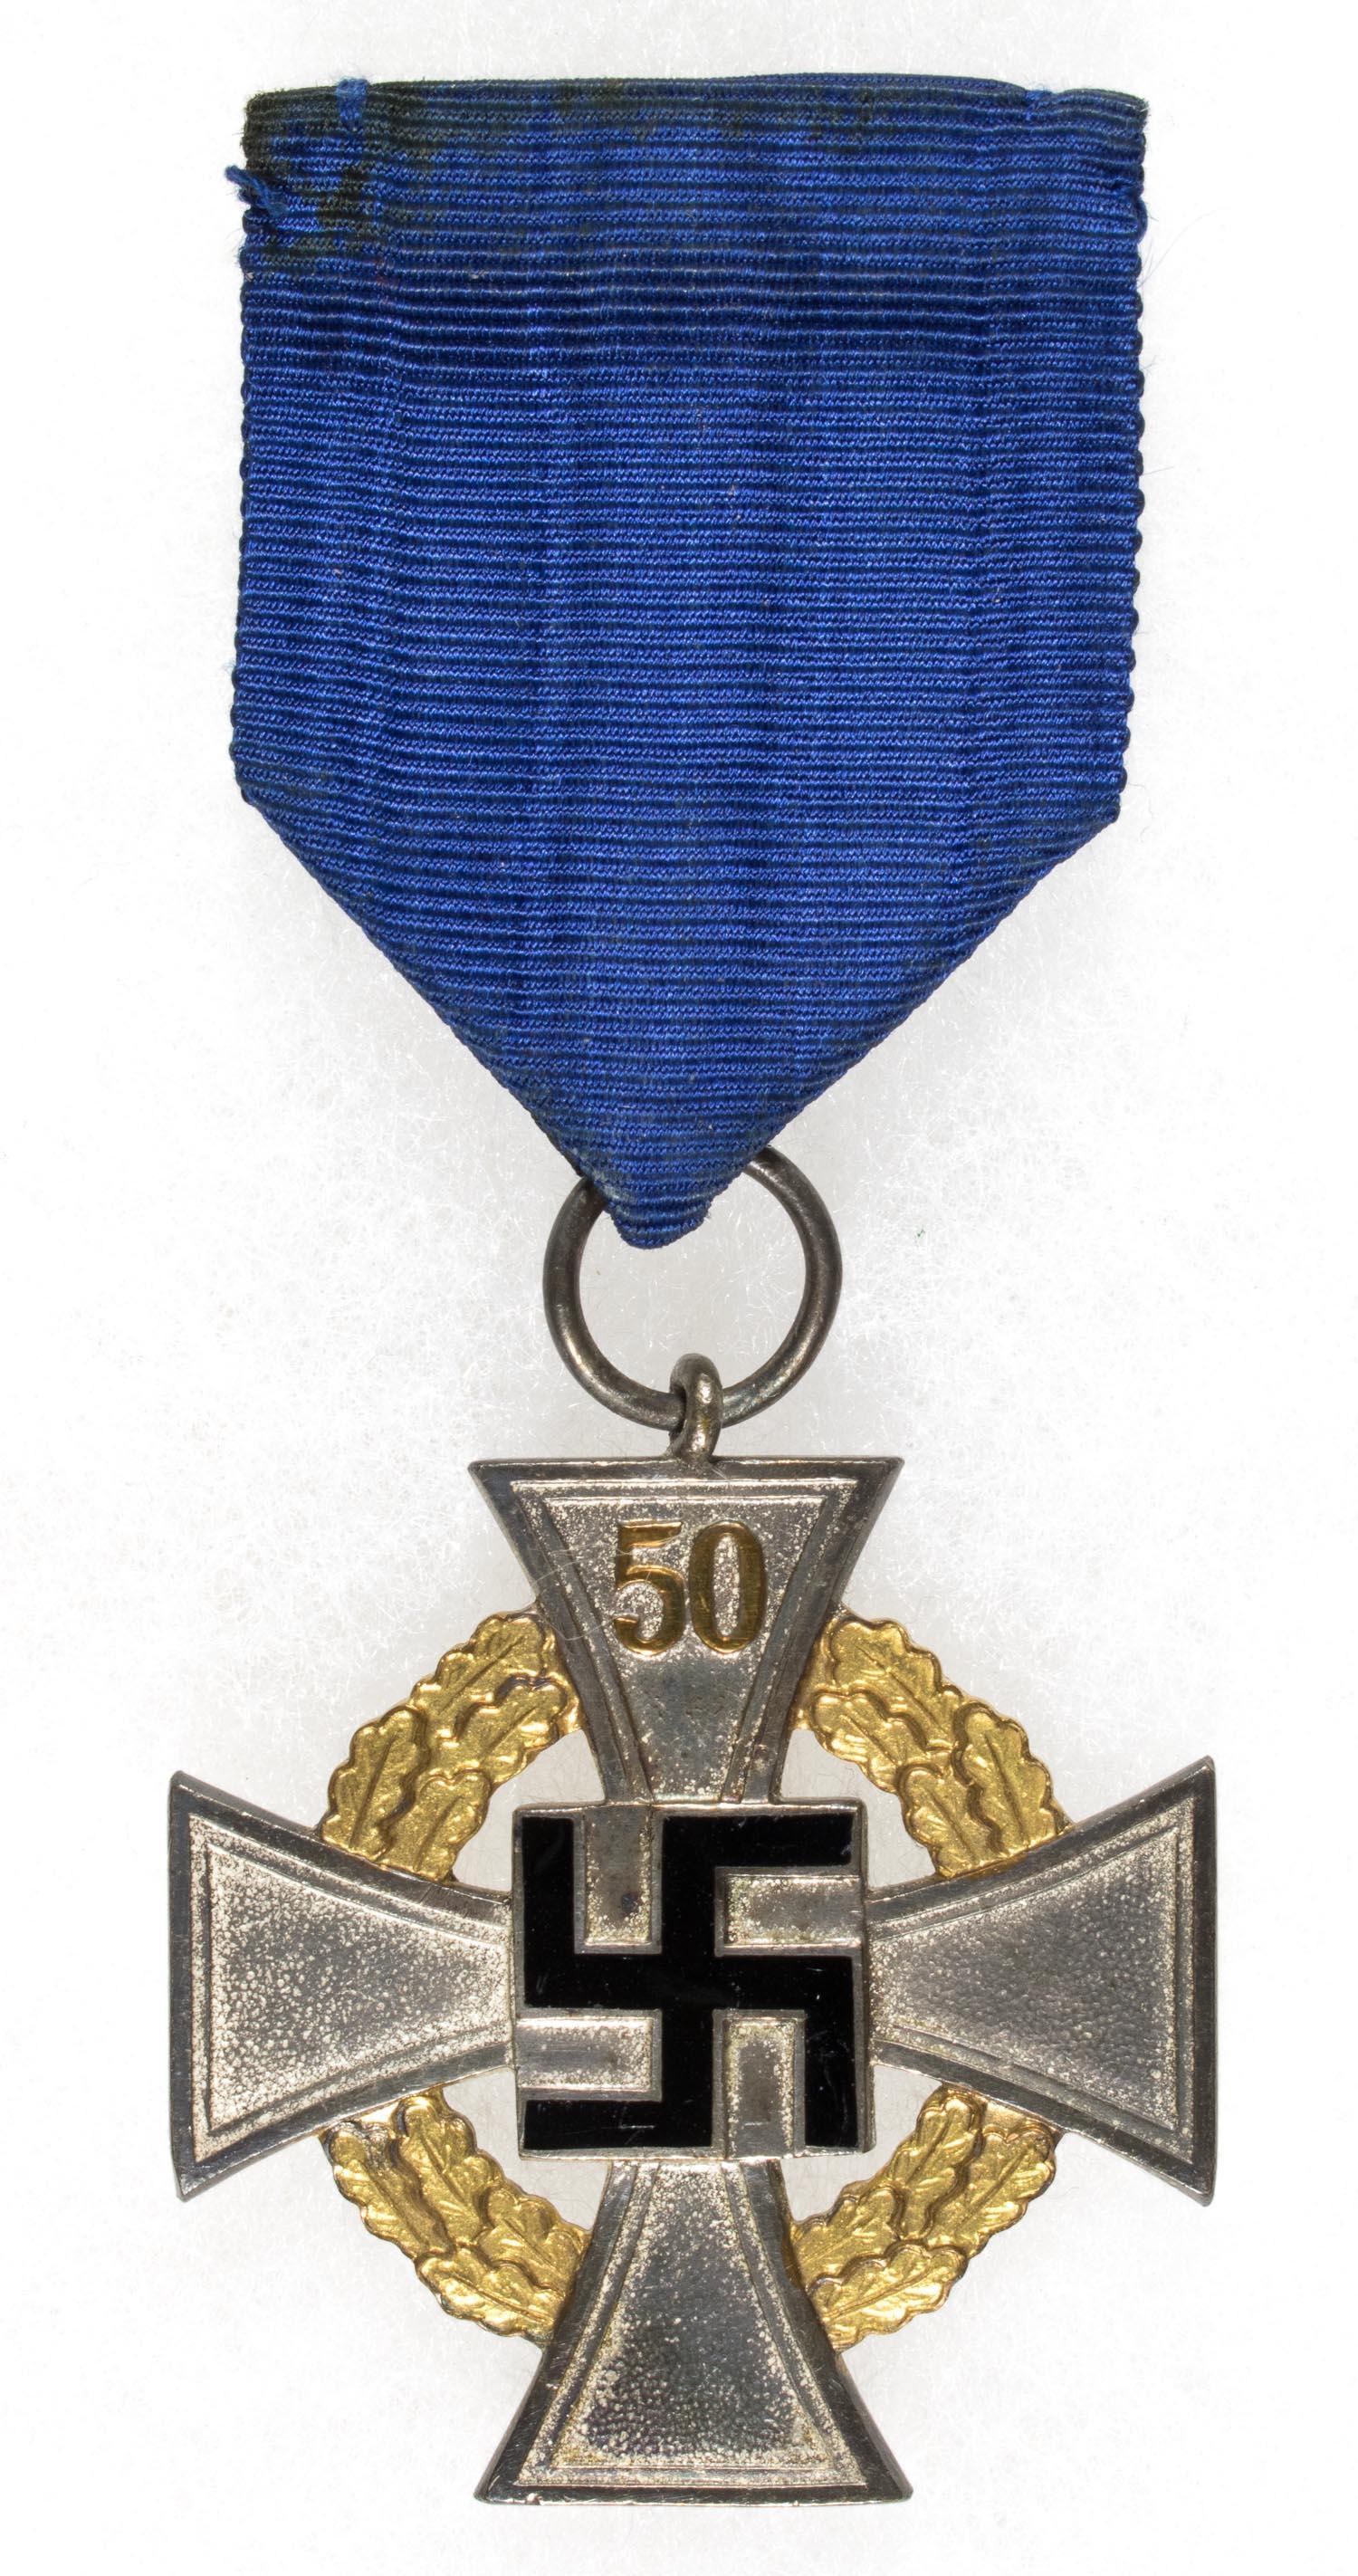 GERMAN 50 YEAR FAITHFUL SERVICE MEDAL